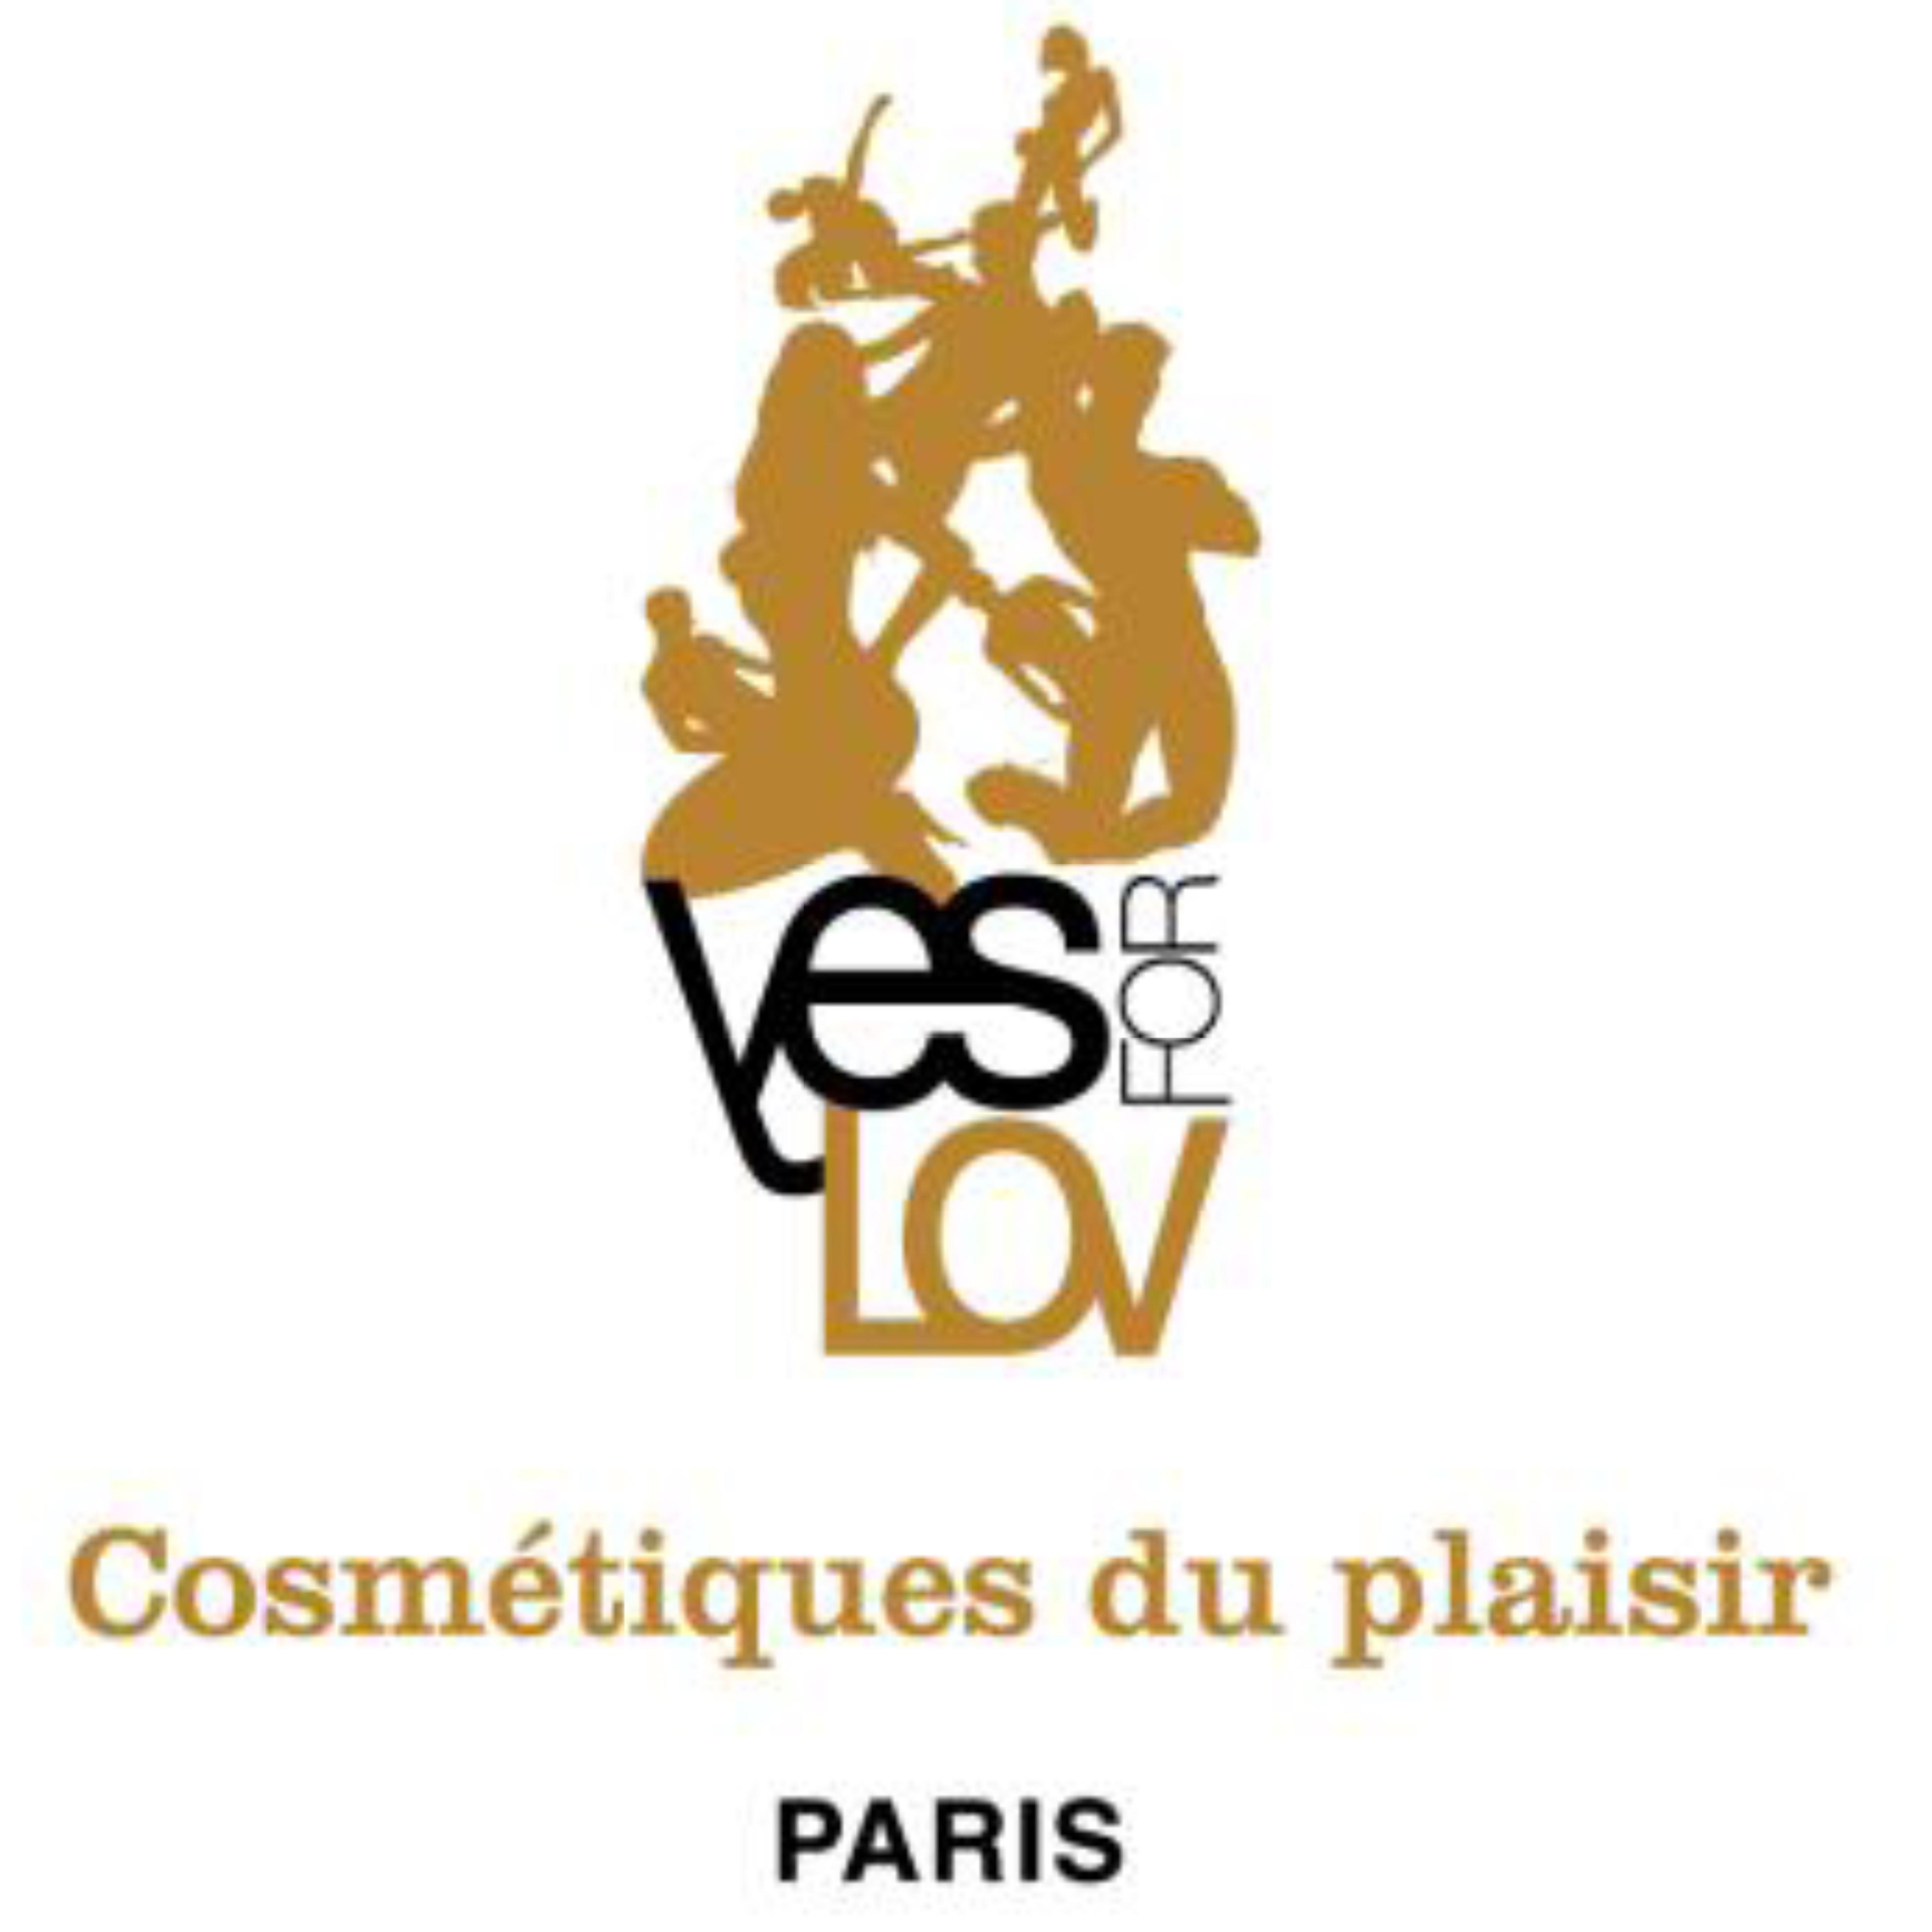 Yes for Lov